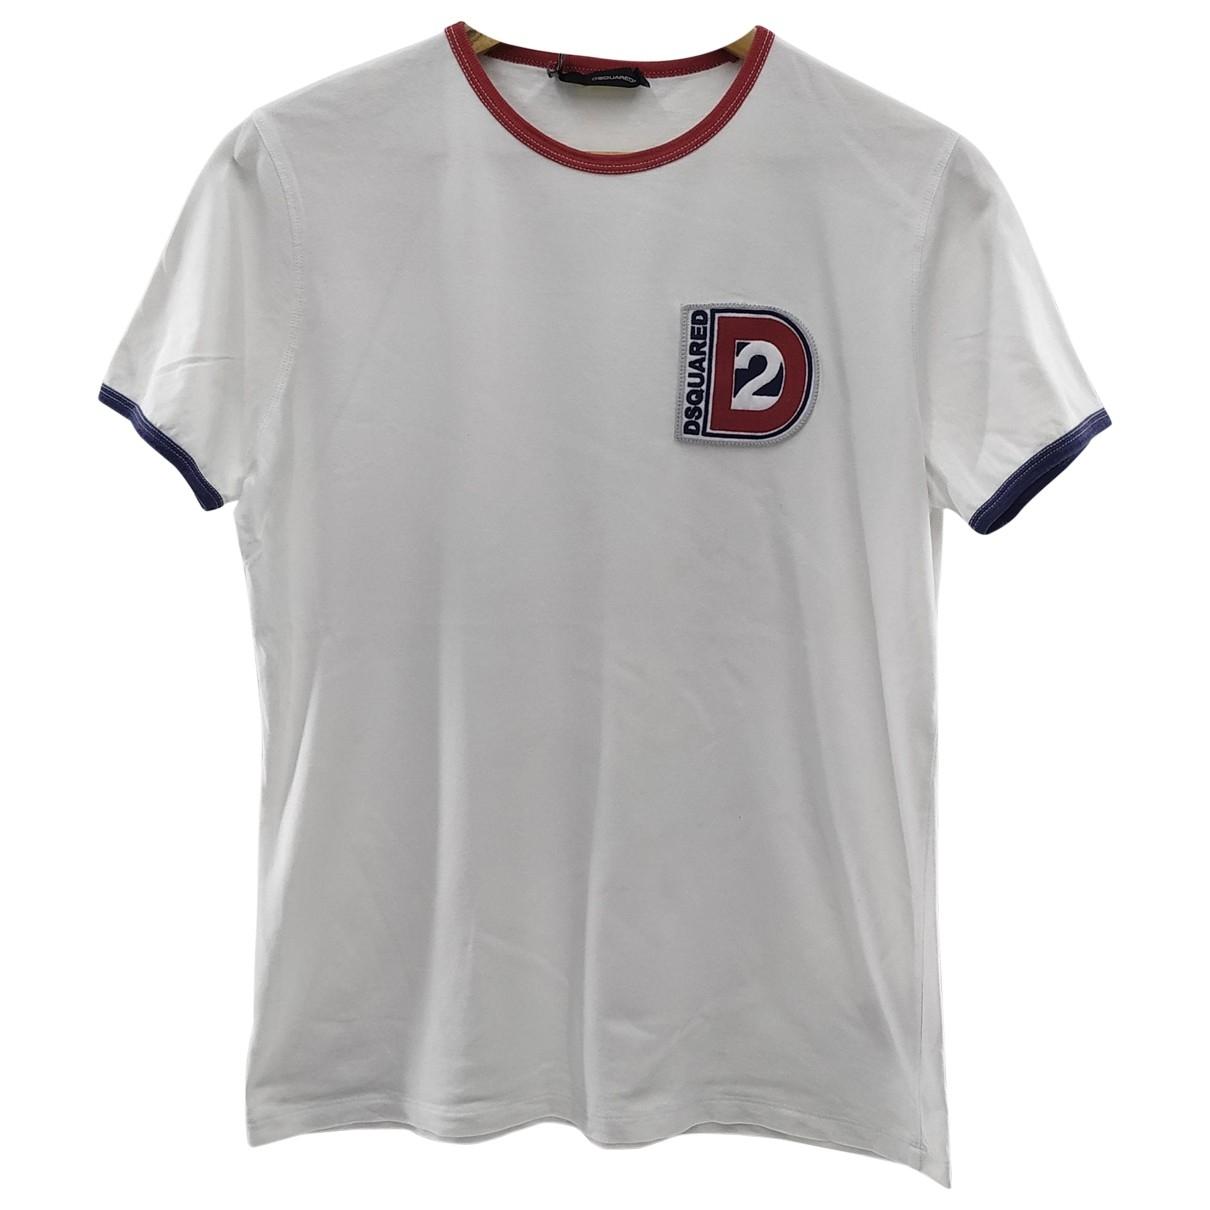 Dsquared2 \N White Cotton T-shirts for Men M